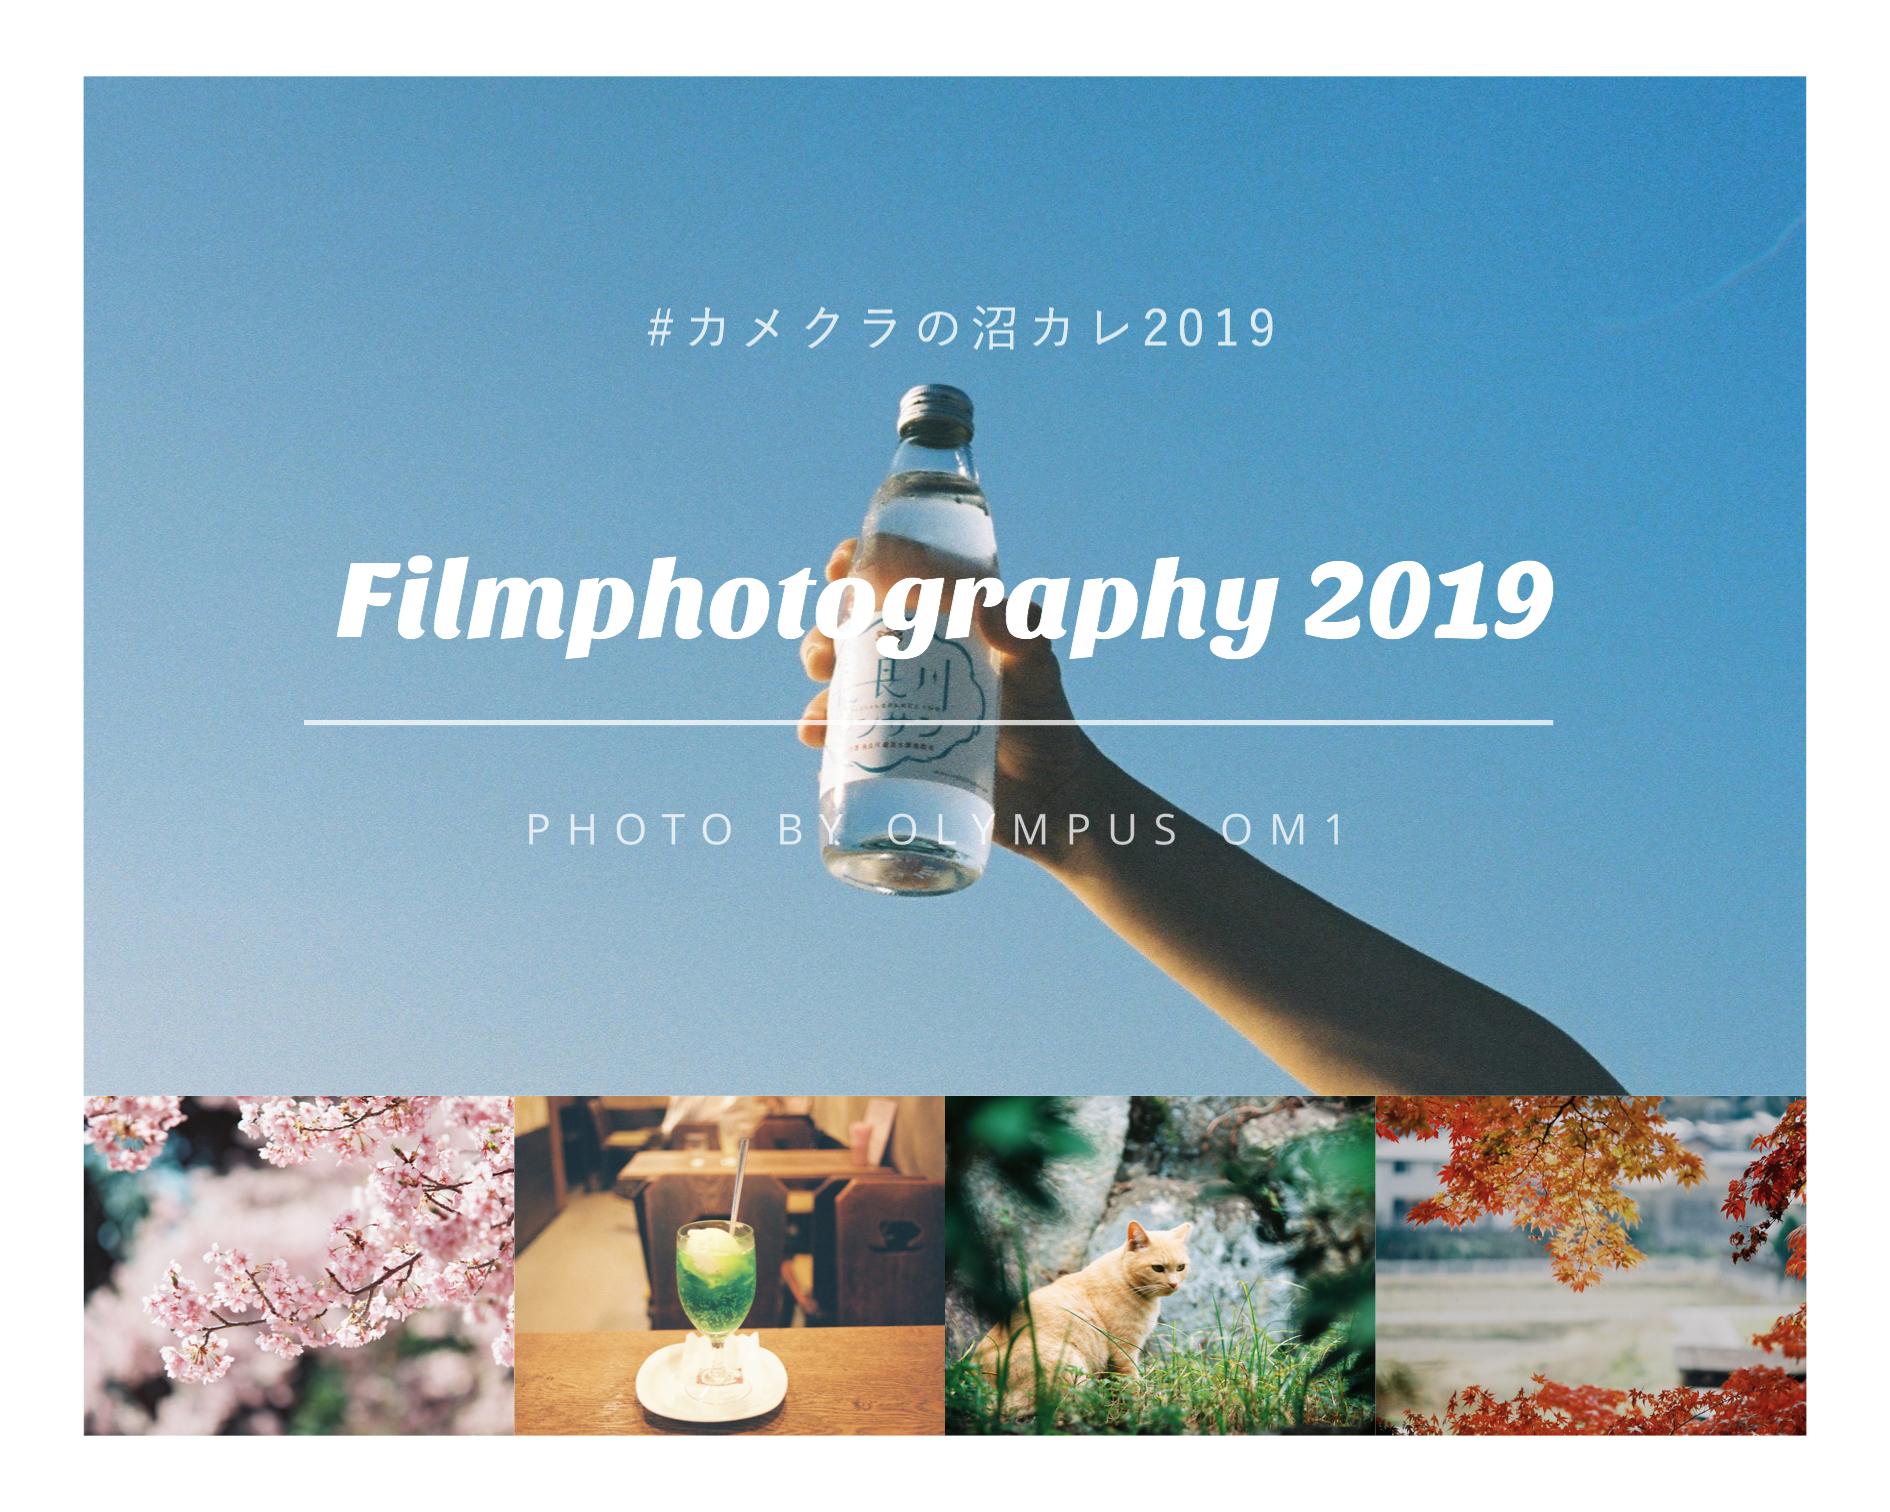 Filmphotography 2019 #カメクラの沼カレ2019